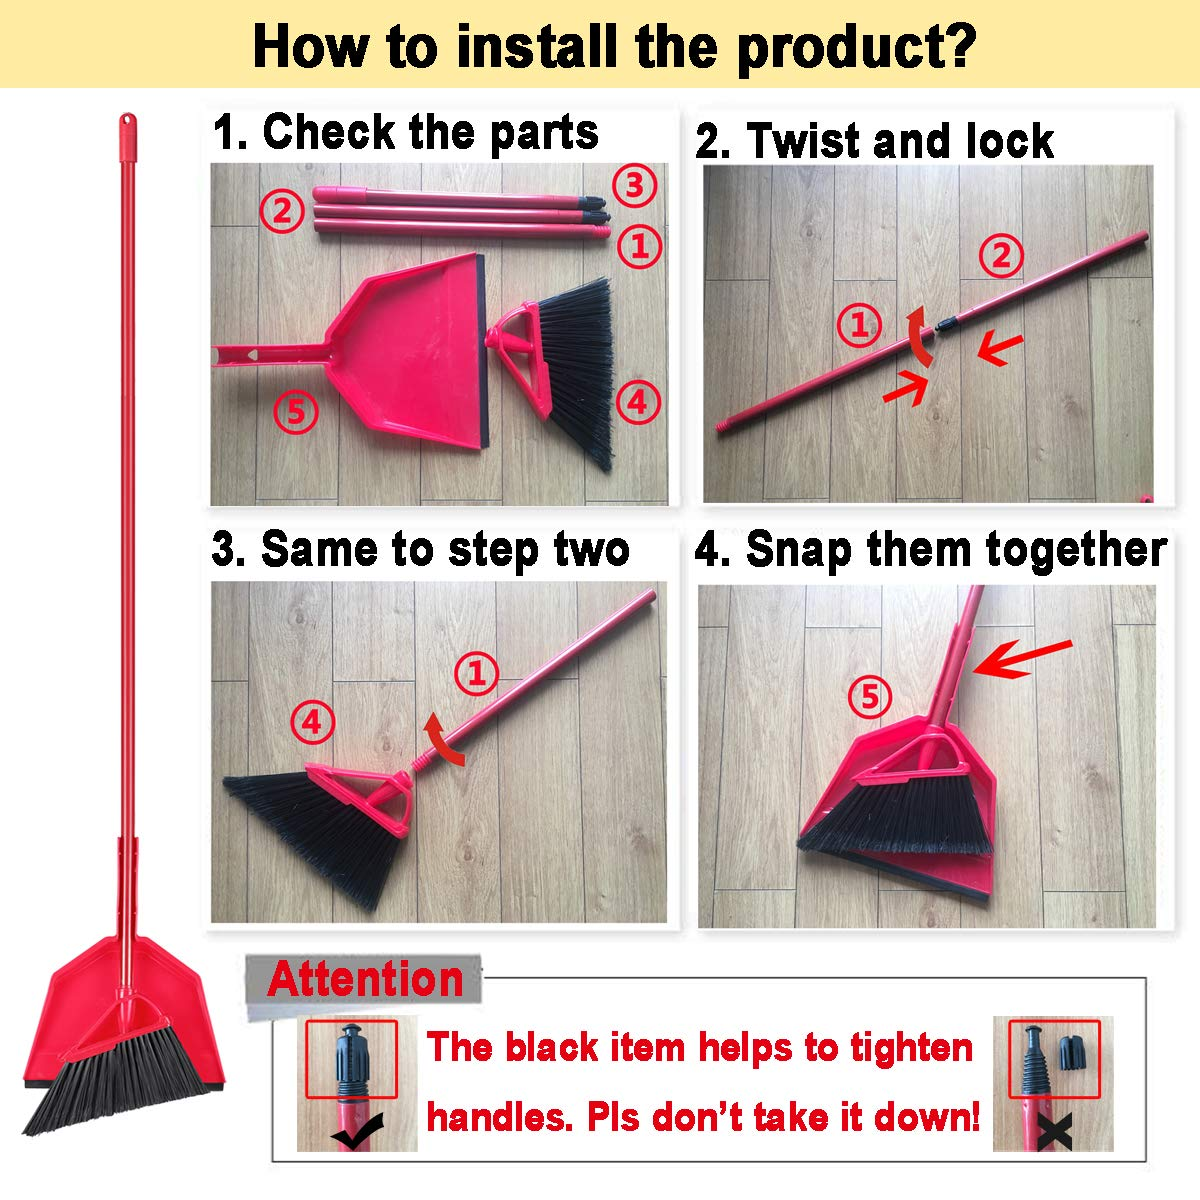 Angle Broom Dustpan Set Rubber Lip Detachable Hand Broom Indoor Outdoor Floor Sweeper Lobby Kitchen Patio Garden Garage Shop Hair Salon by Iamagie (Image #8)